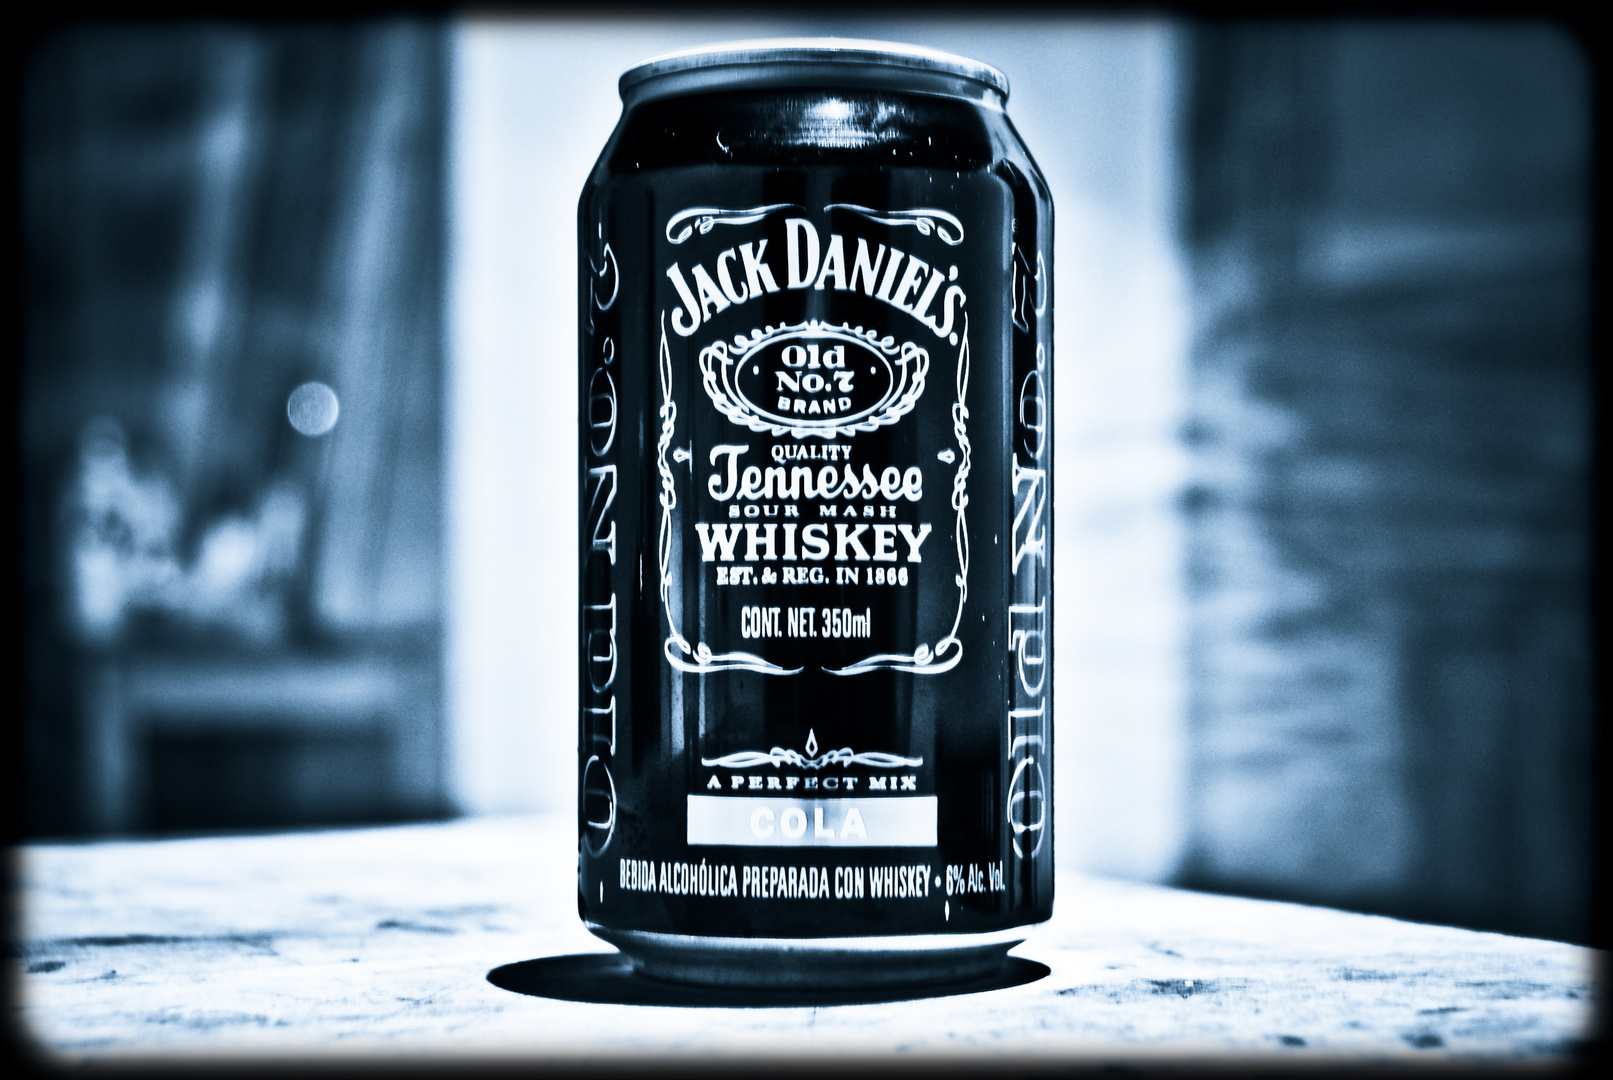 i do jacky cola Foto & Bild | stillleben, food-fotografie